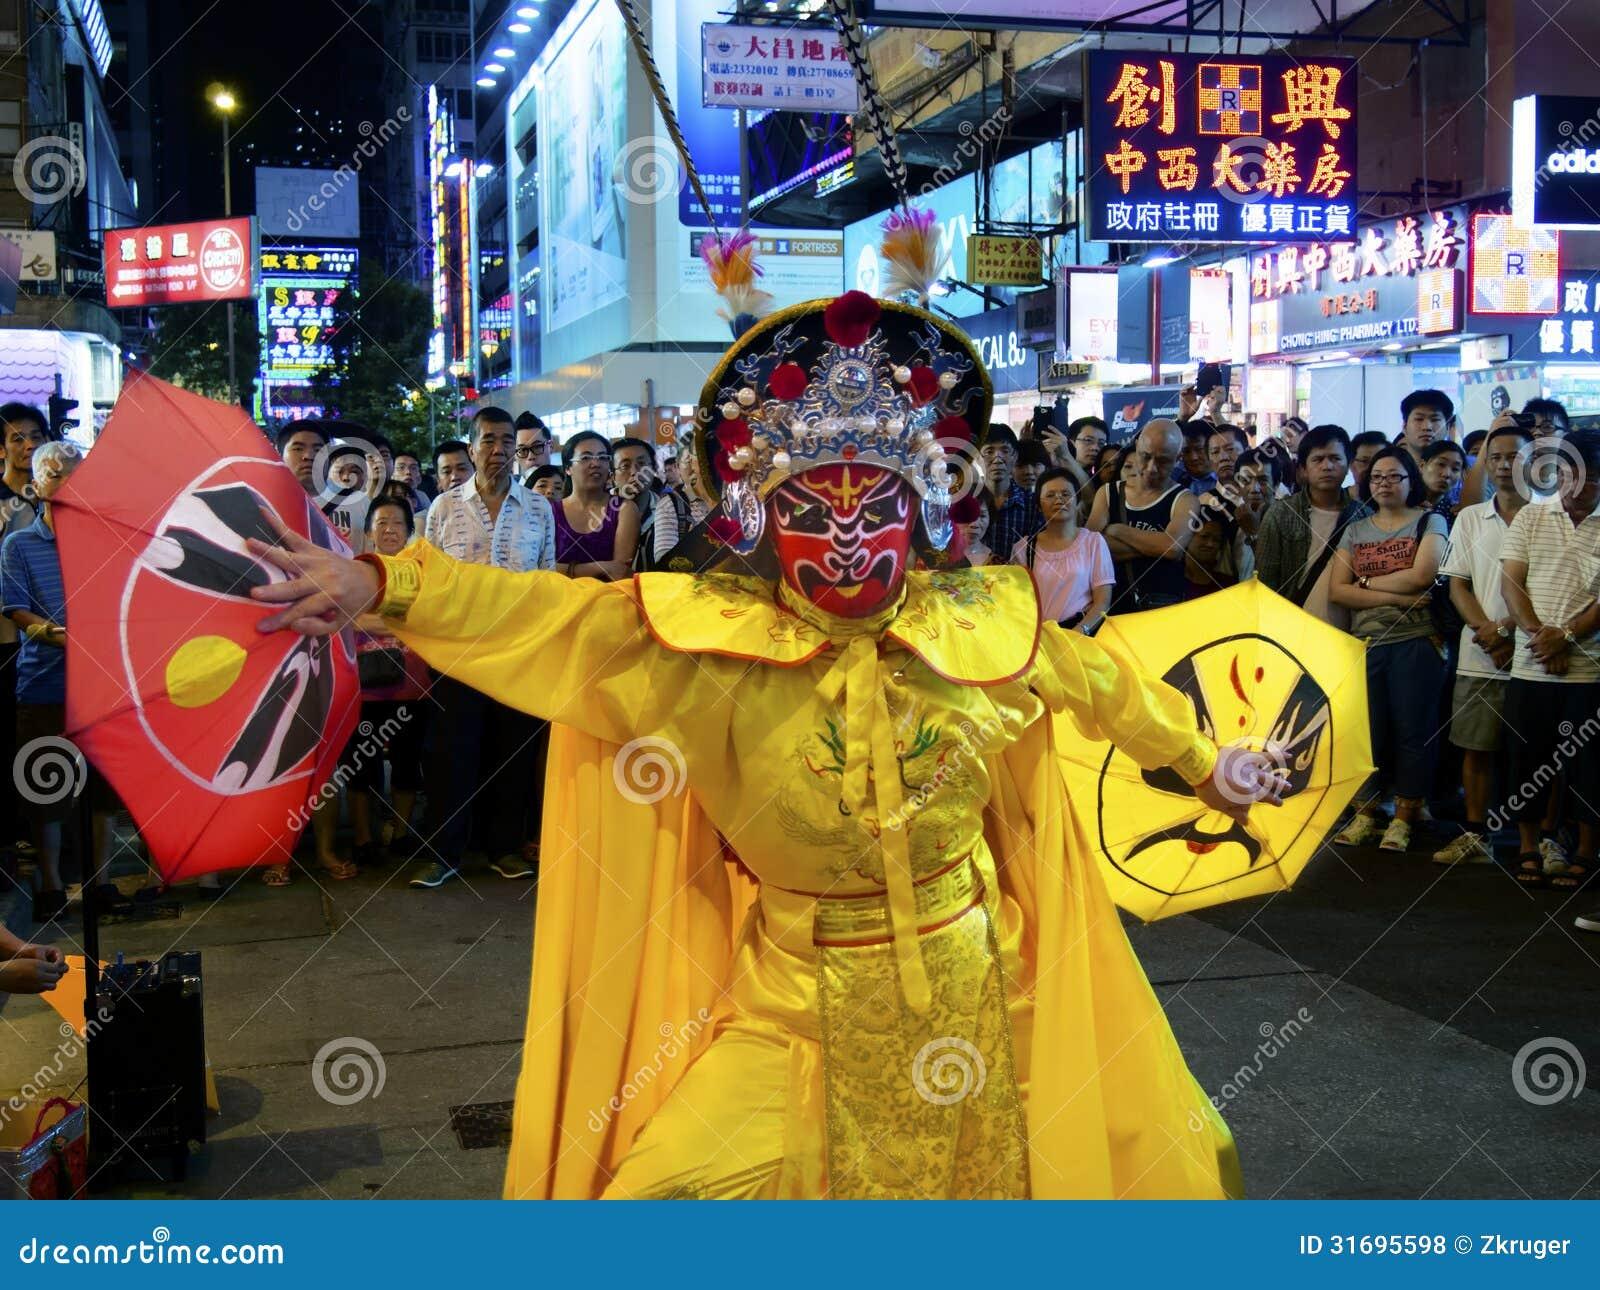 Performance legitimacy in hong kong